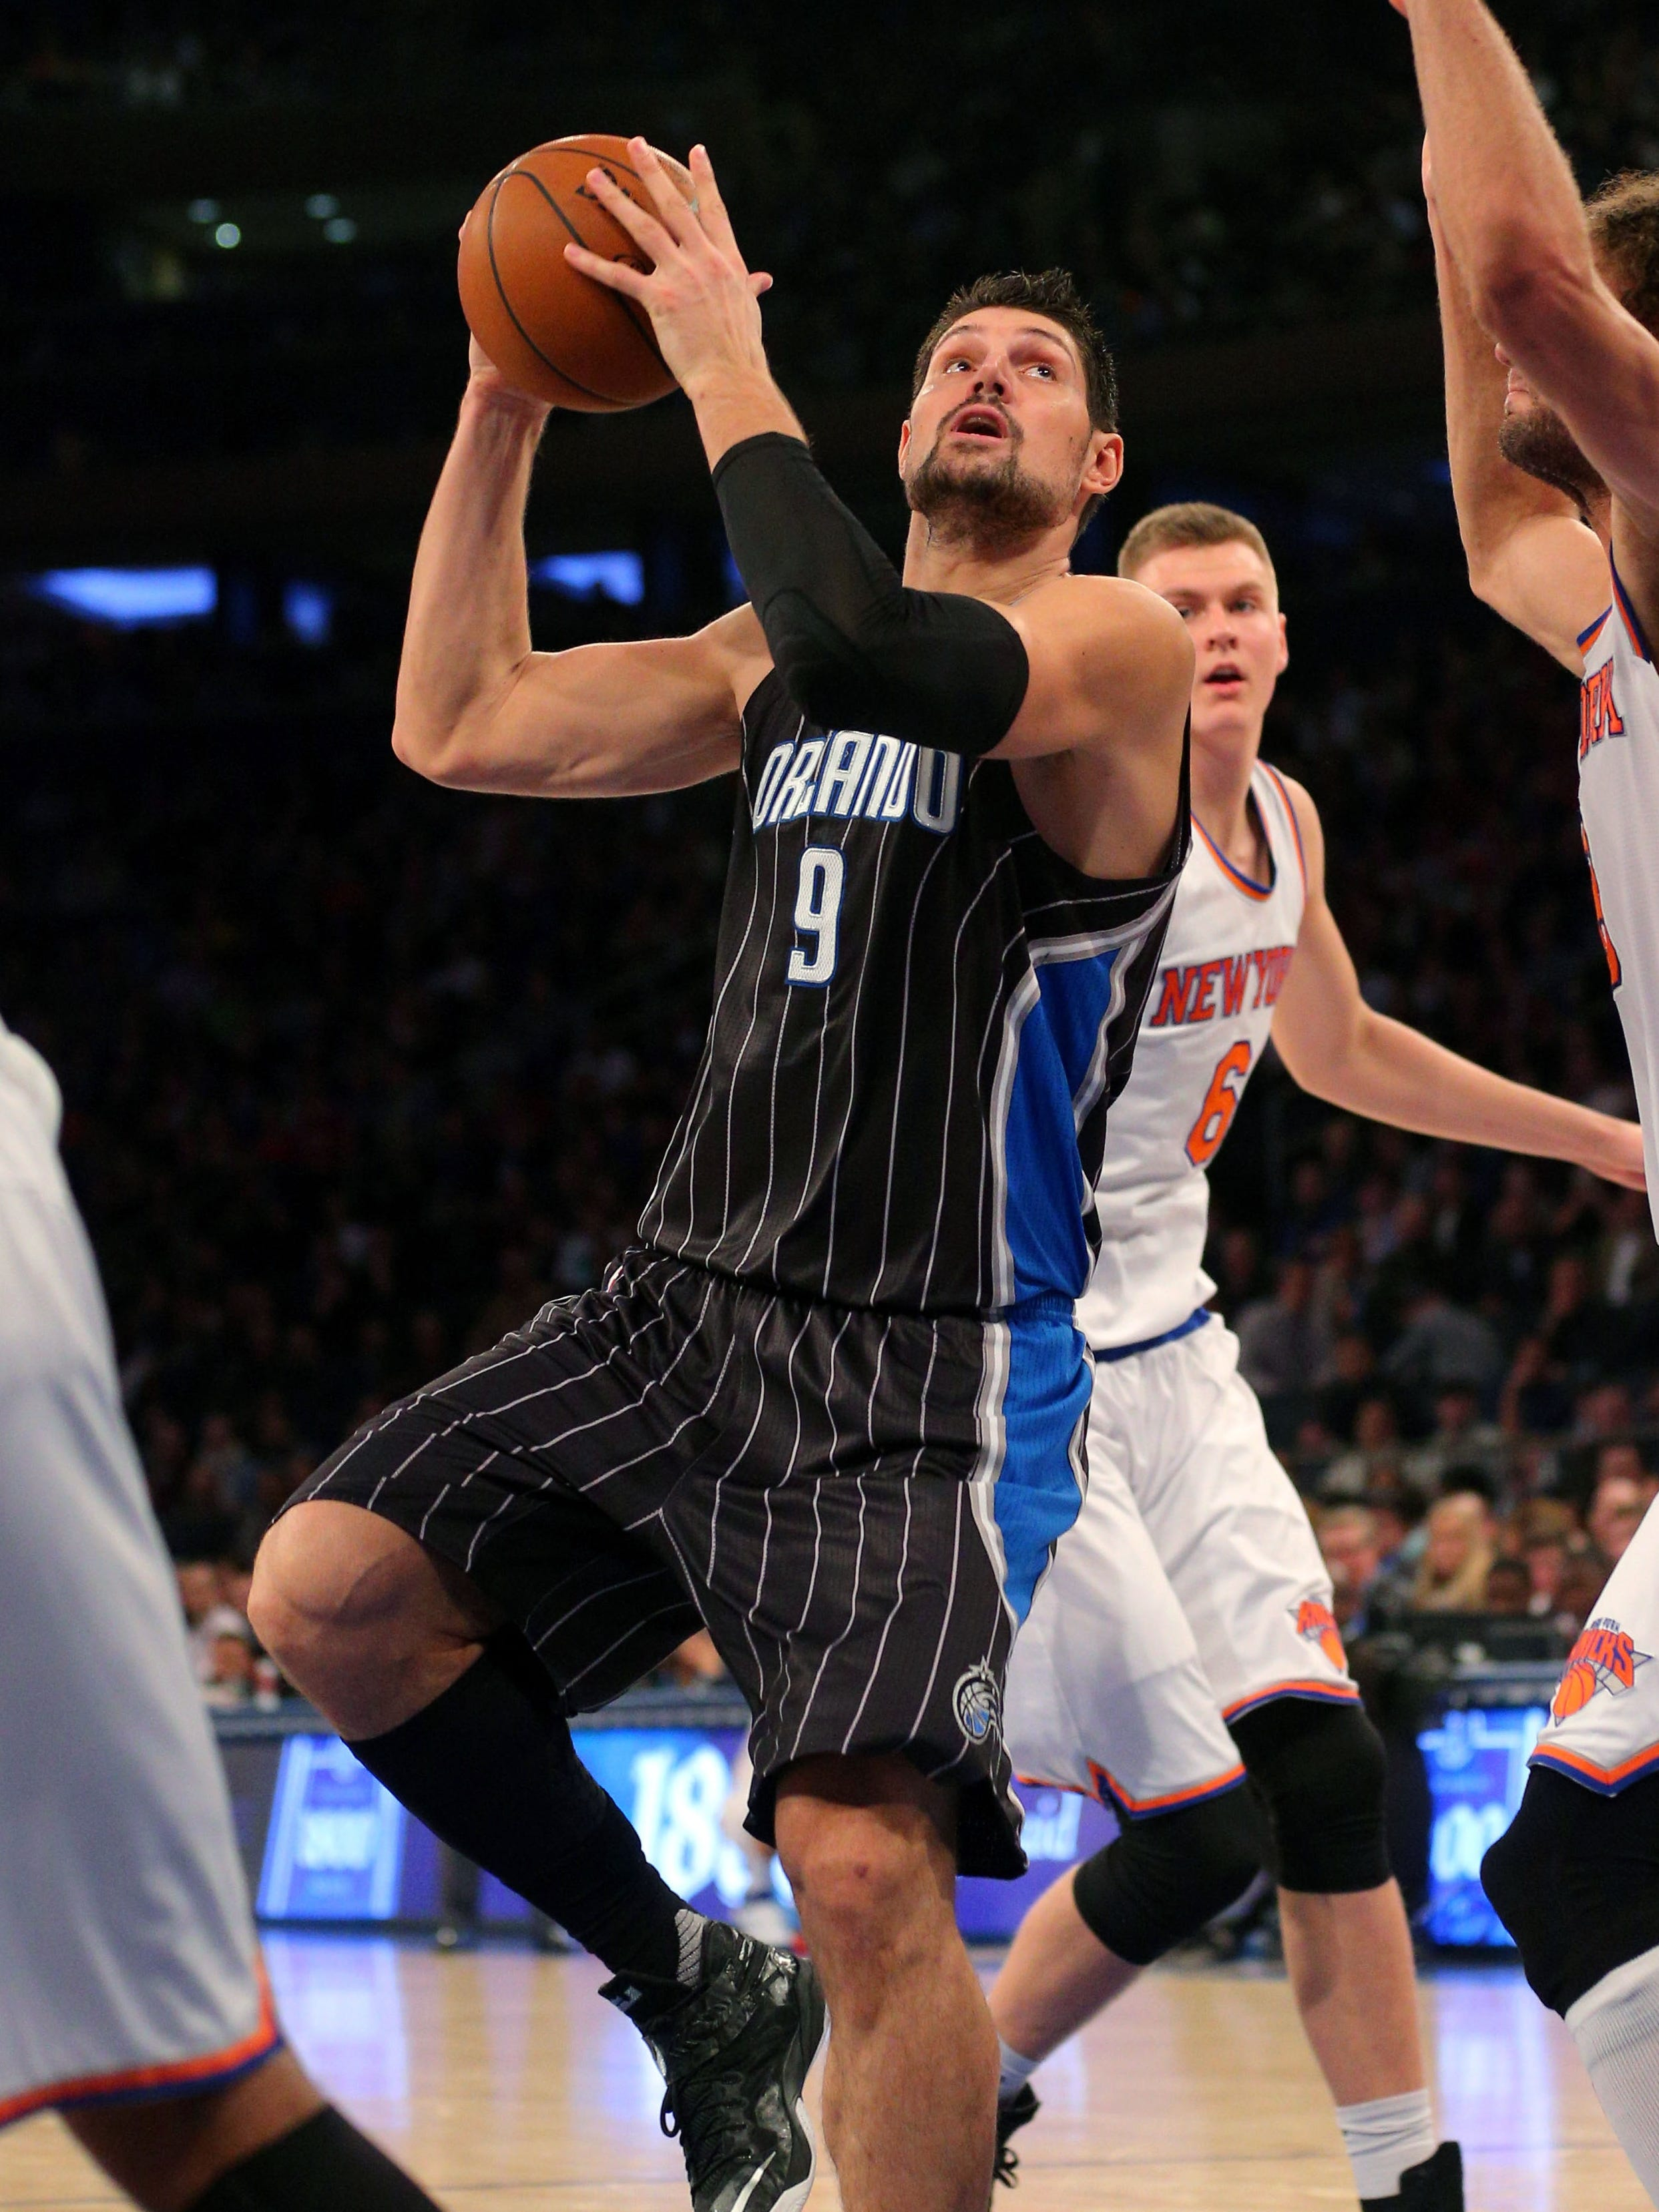 New York Knicks Joakim Noah Signed Basketball Coa Superior Materials Sports Mem, Cards & Fan Shop